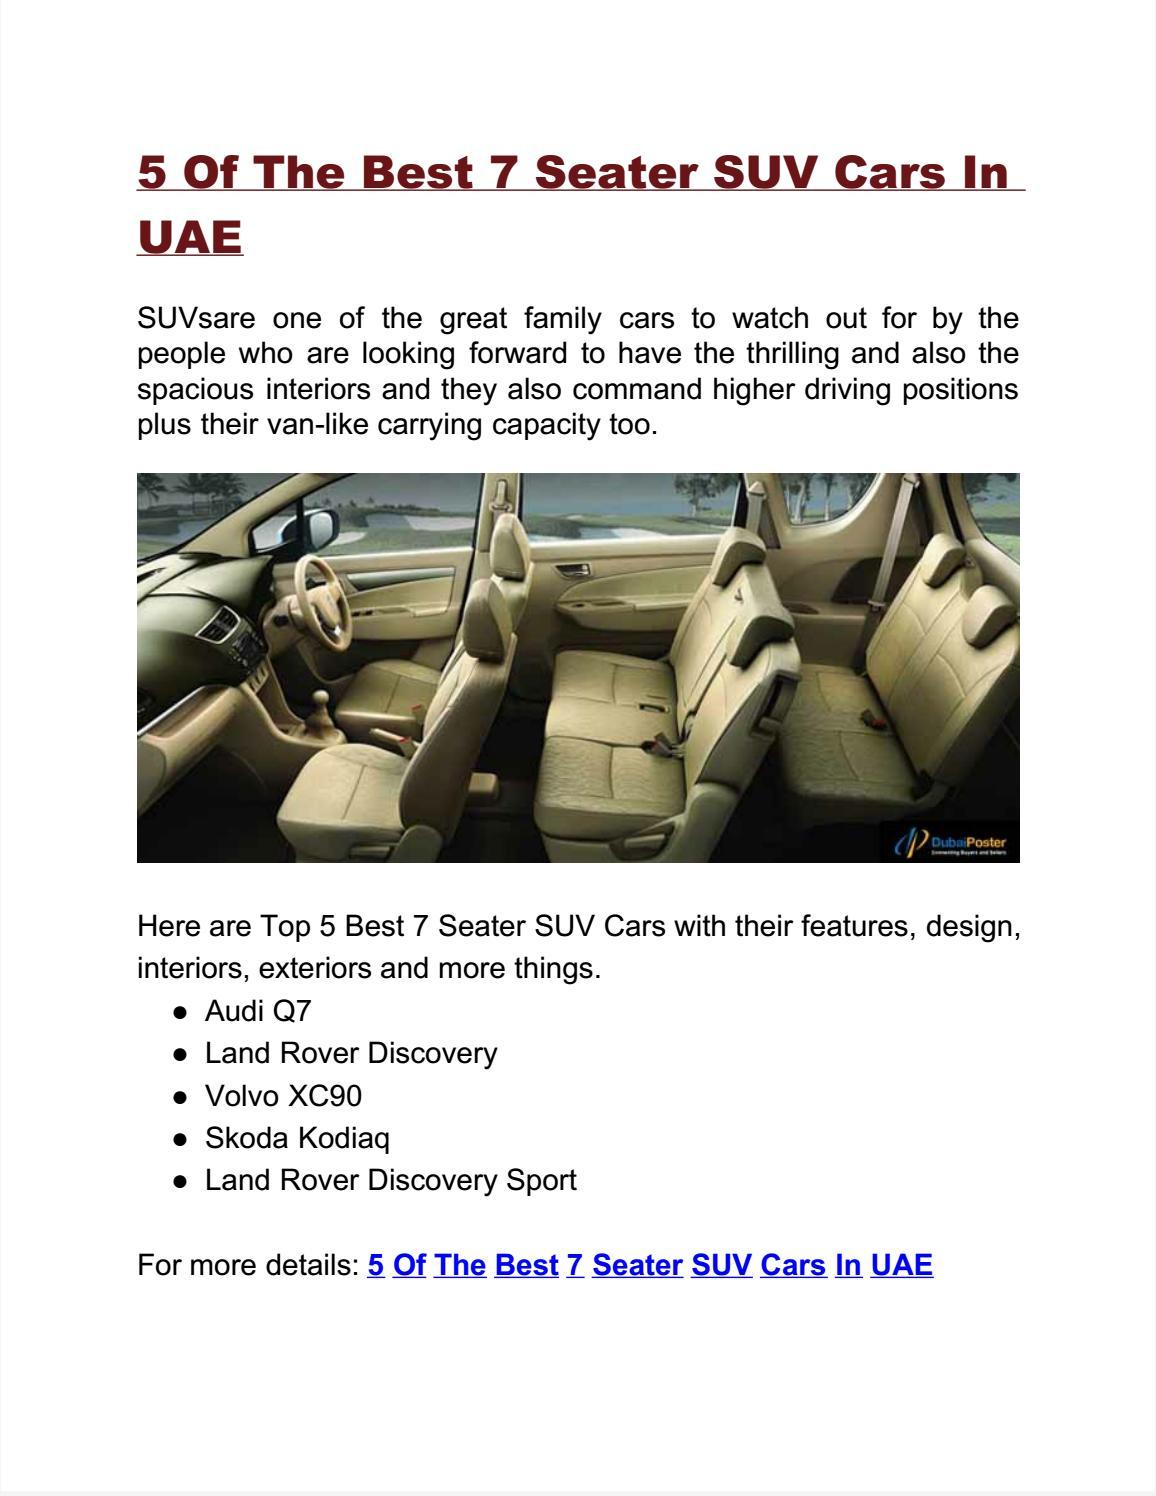 5 Of The Best 7 Seater Suv Cars In Uae By Ritika Jain Issuu